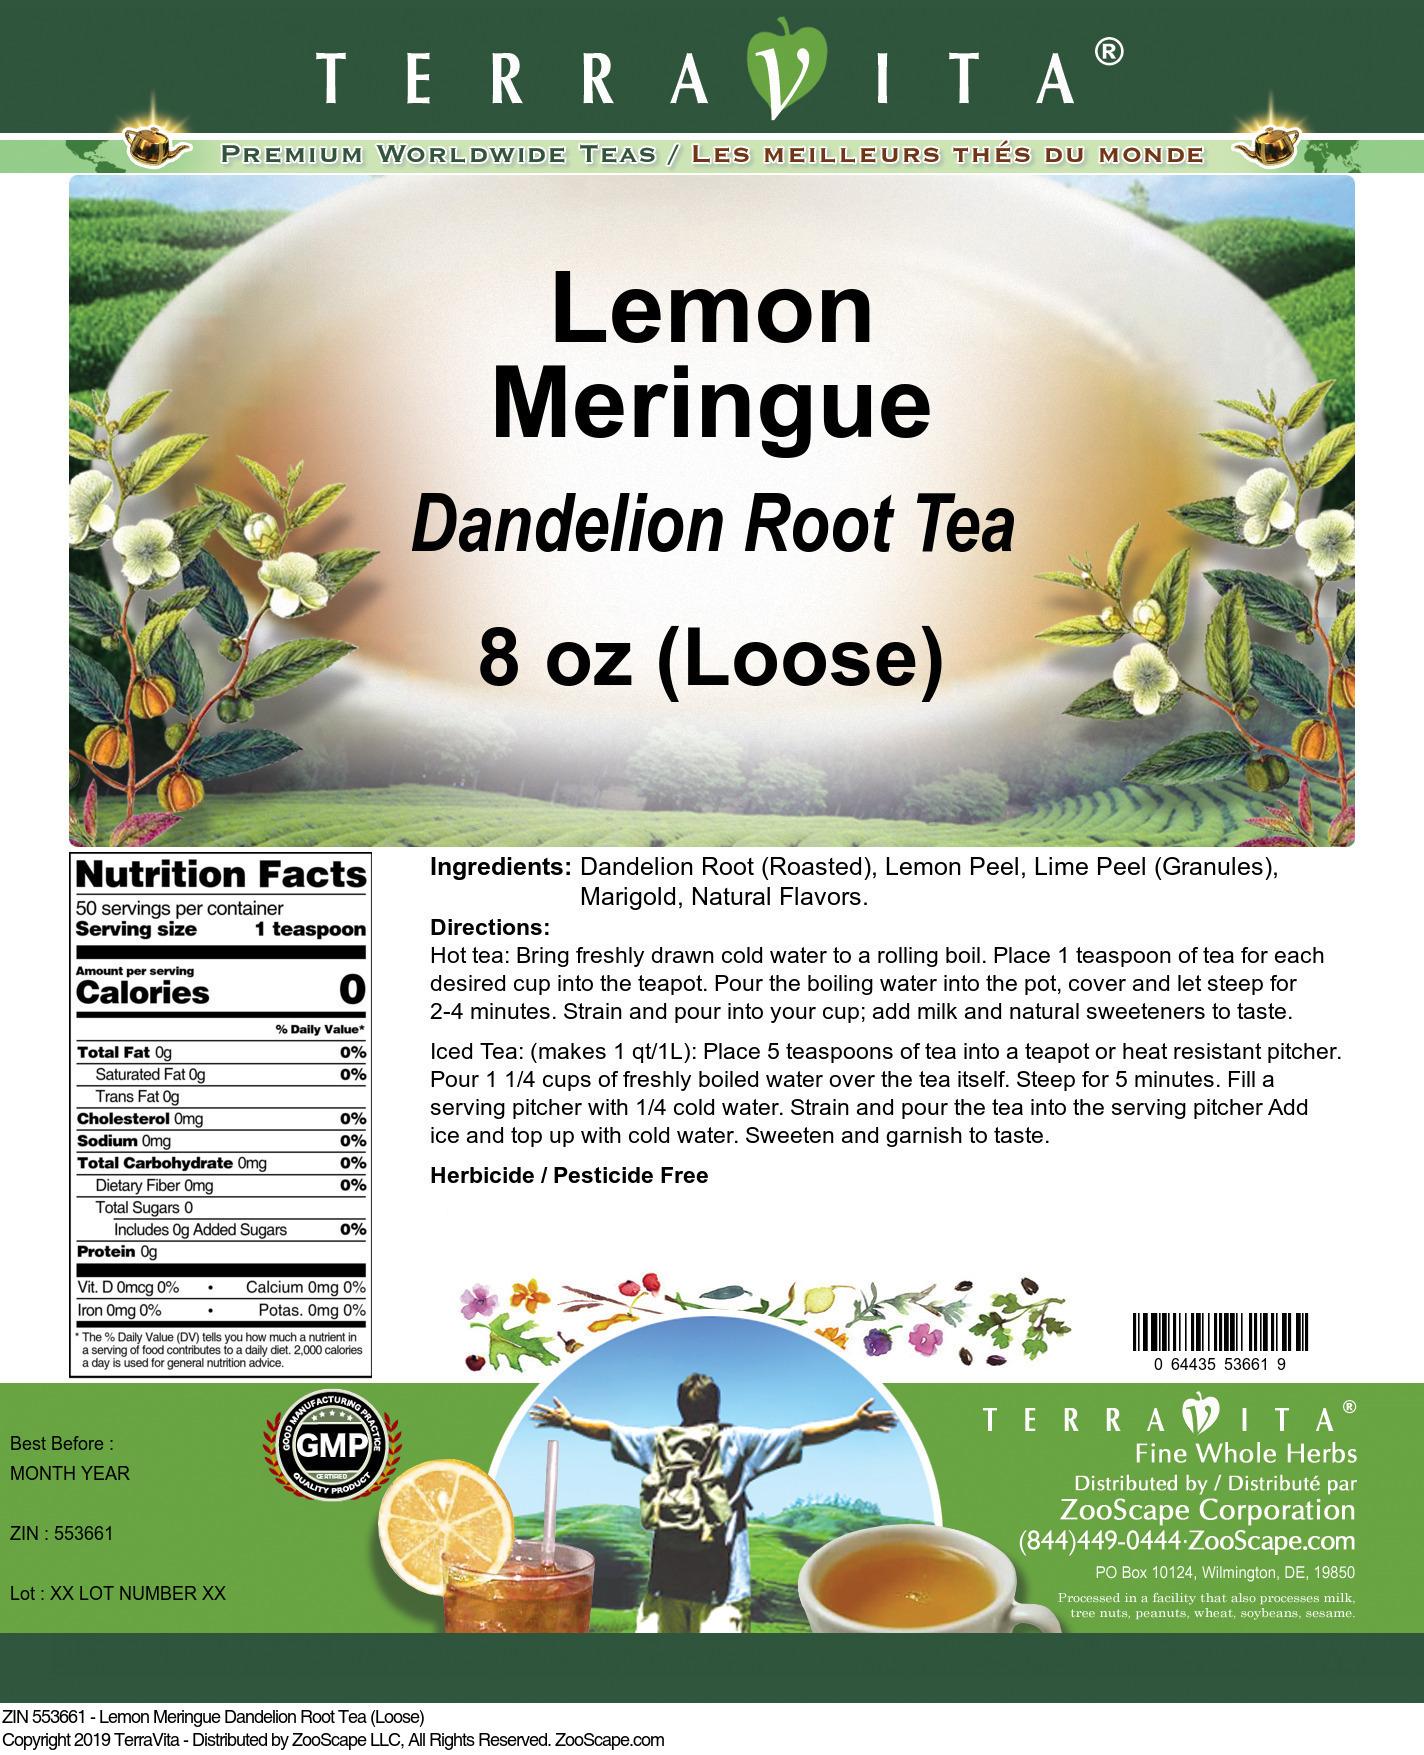 Lemon Meringue Dandelion Root